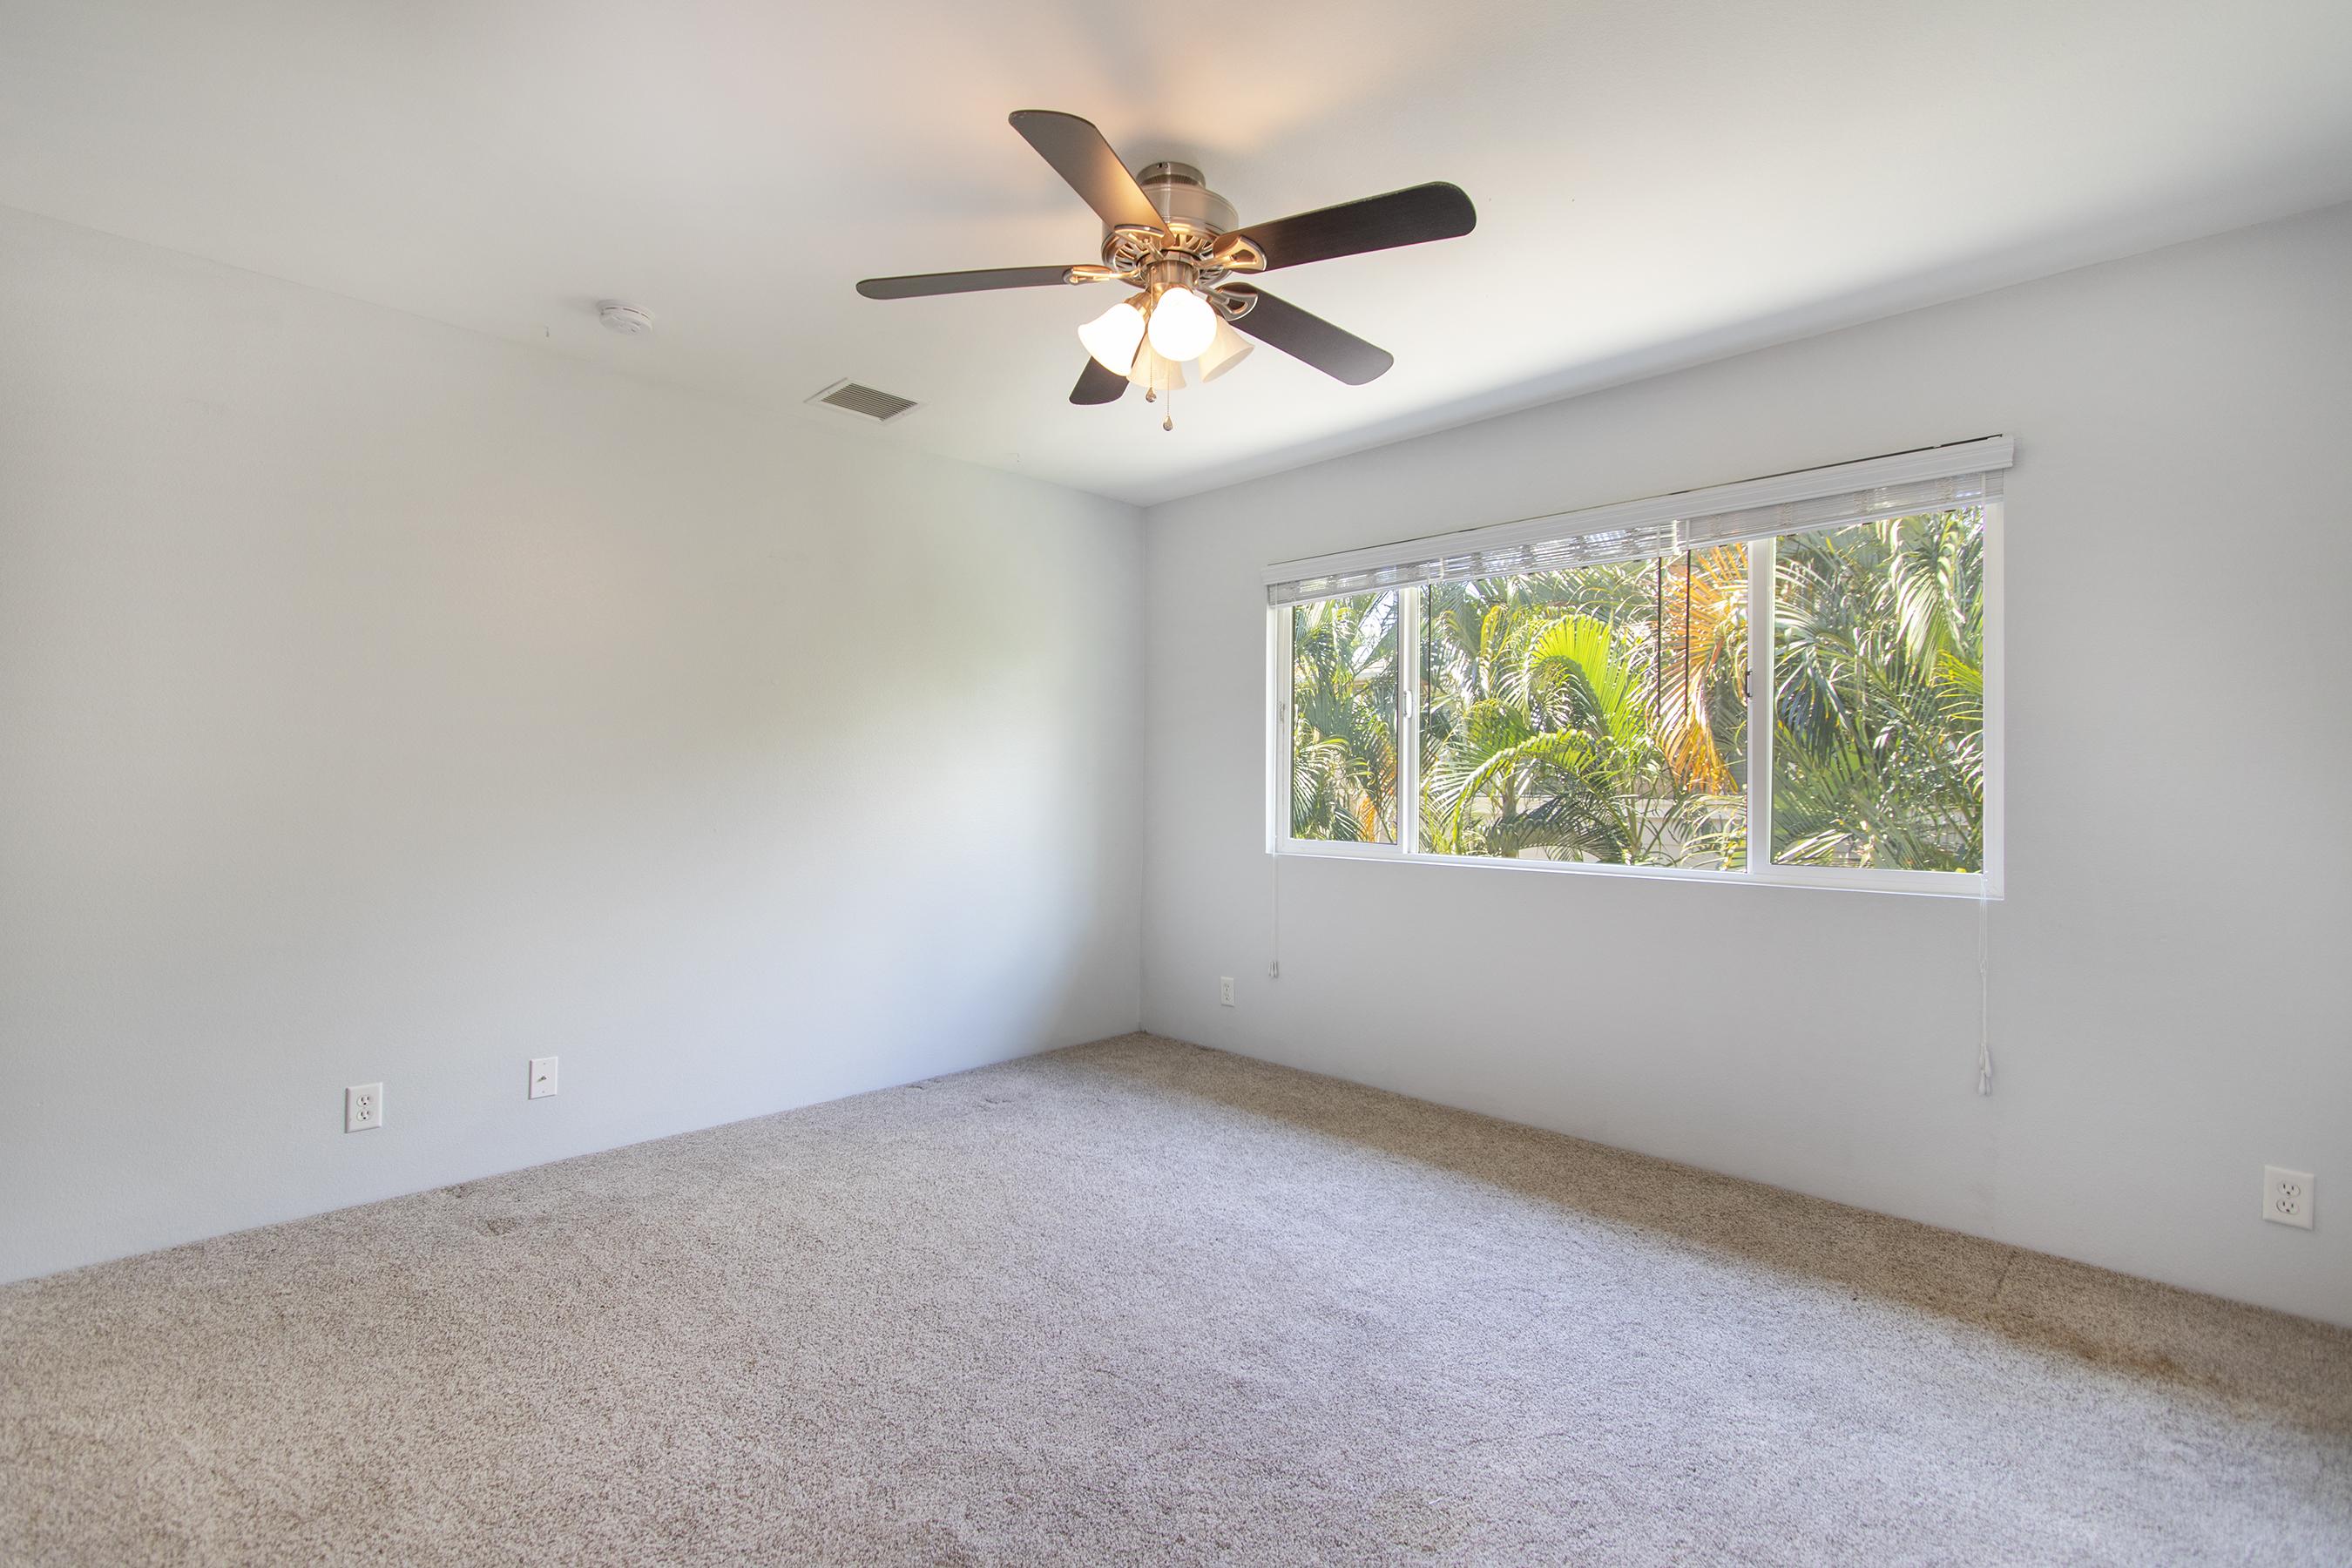 Master Bedroom at 91-1200 Keaunui Drive #14